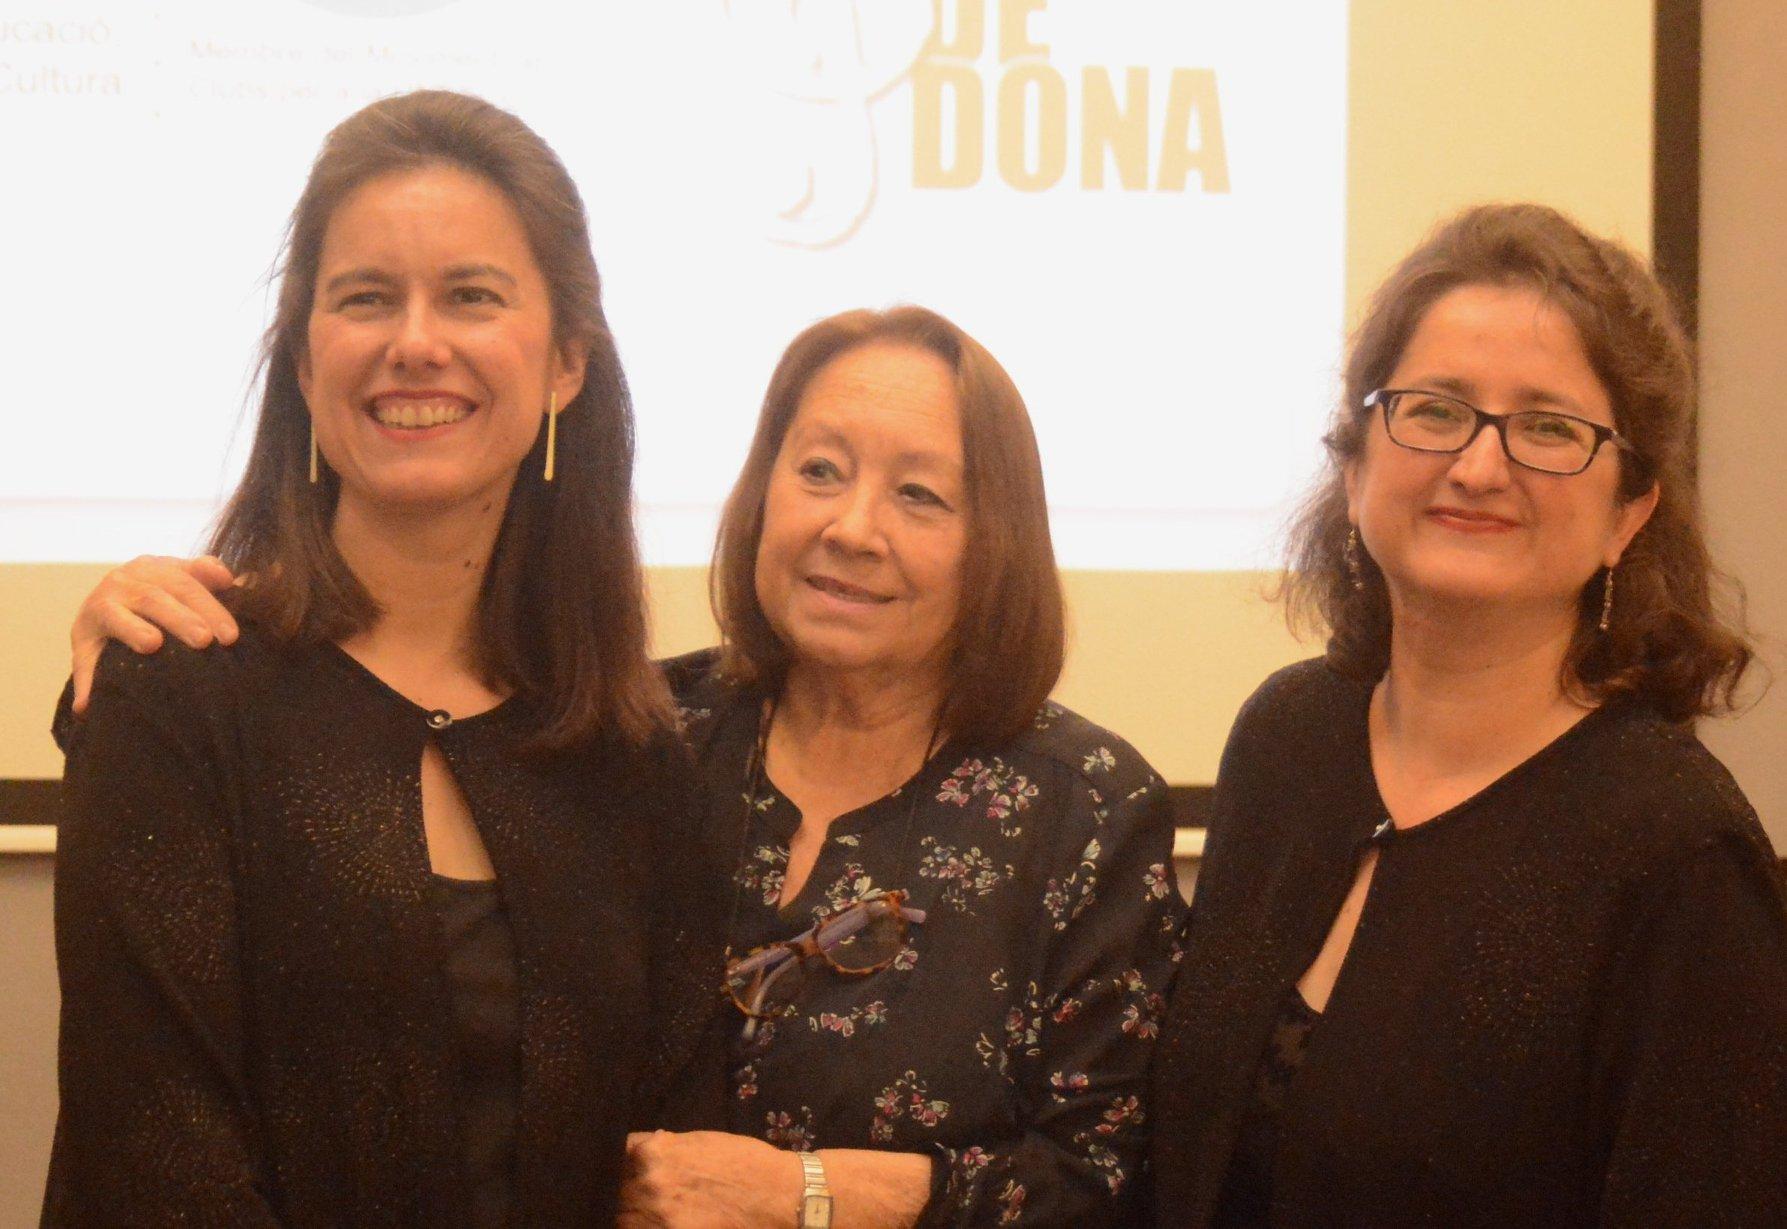 Duo Vela amb la compositora M. Rosa Ribas